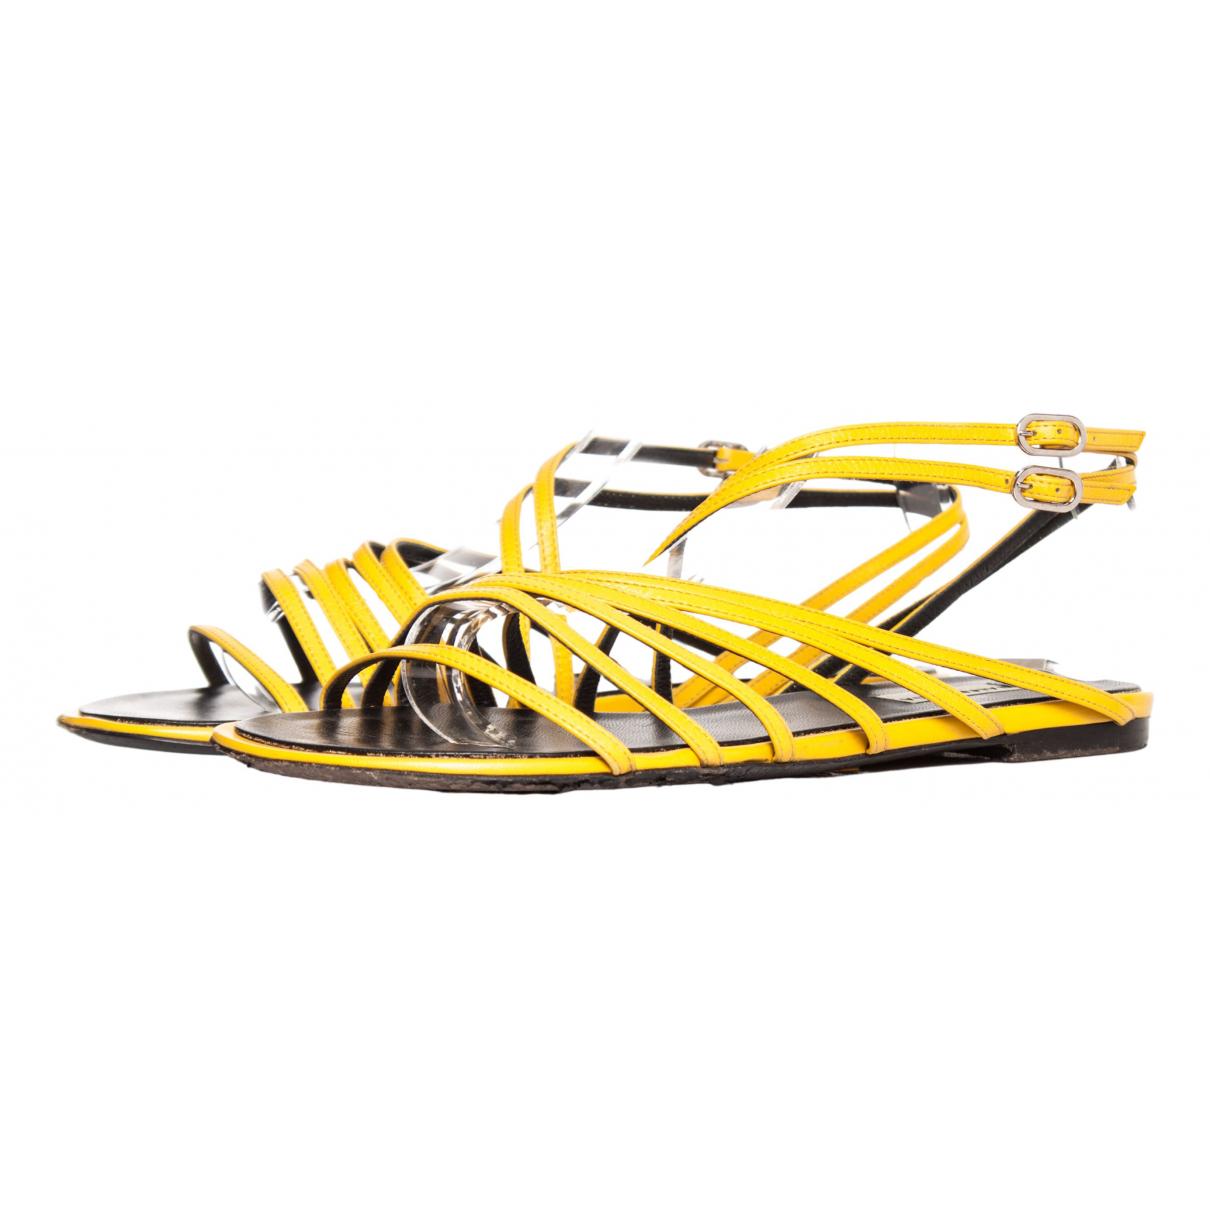 Balenciaga N Yellow Leather Sandals for Women 38.5 EU